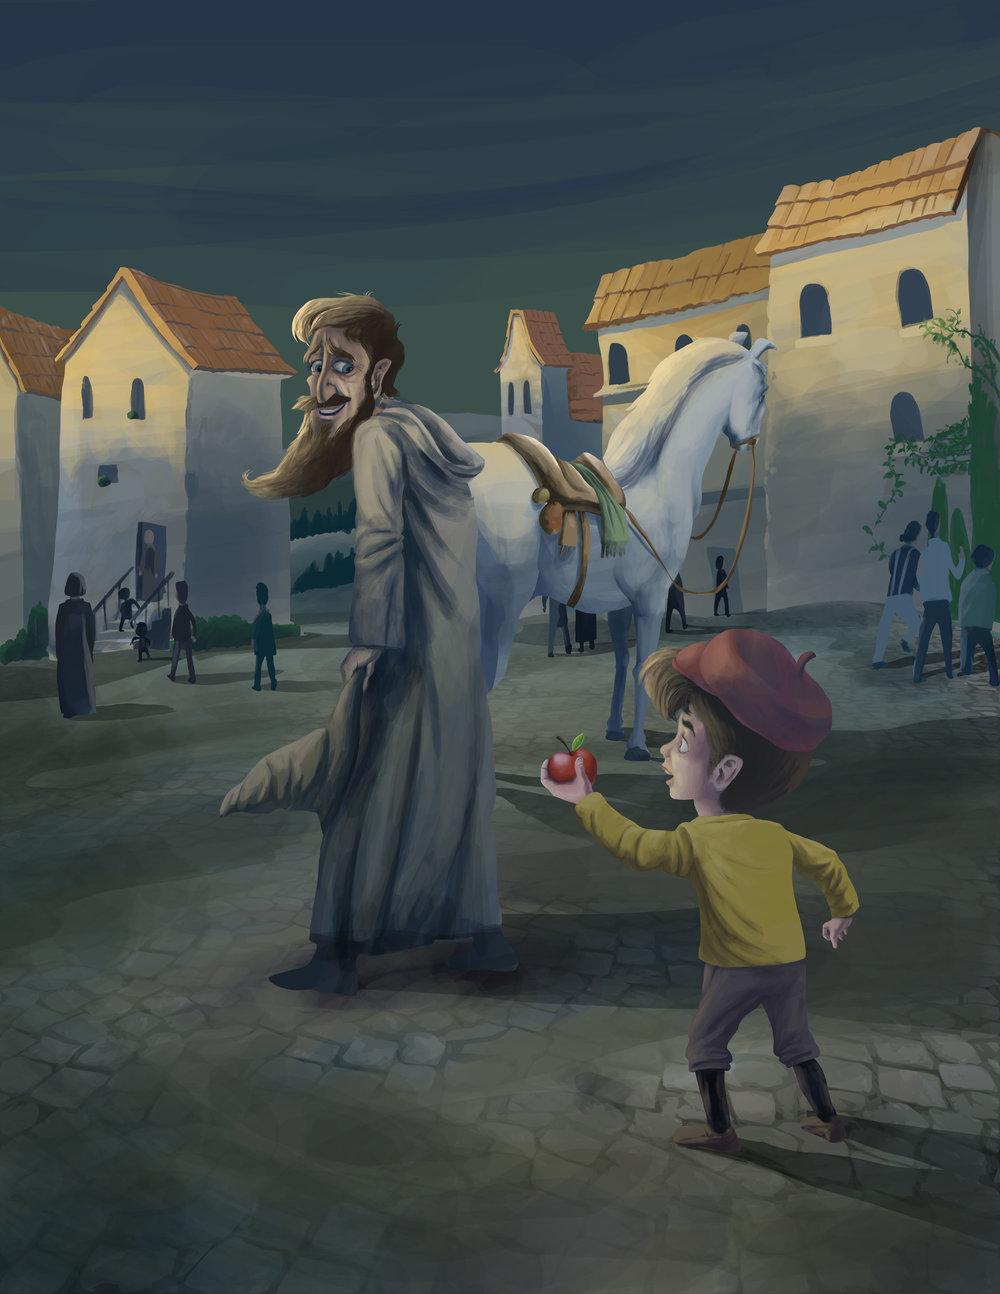 Giacomo the Pumpkin - Help from Anyone